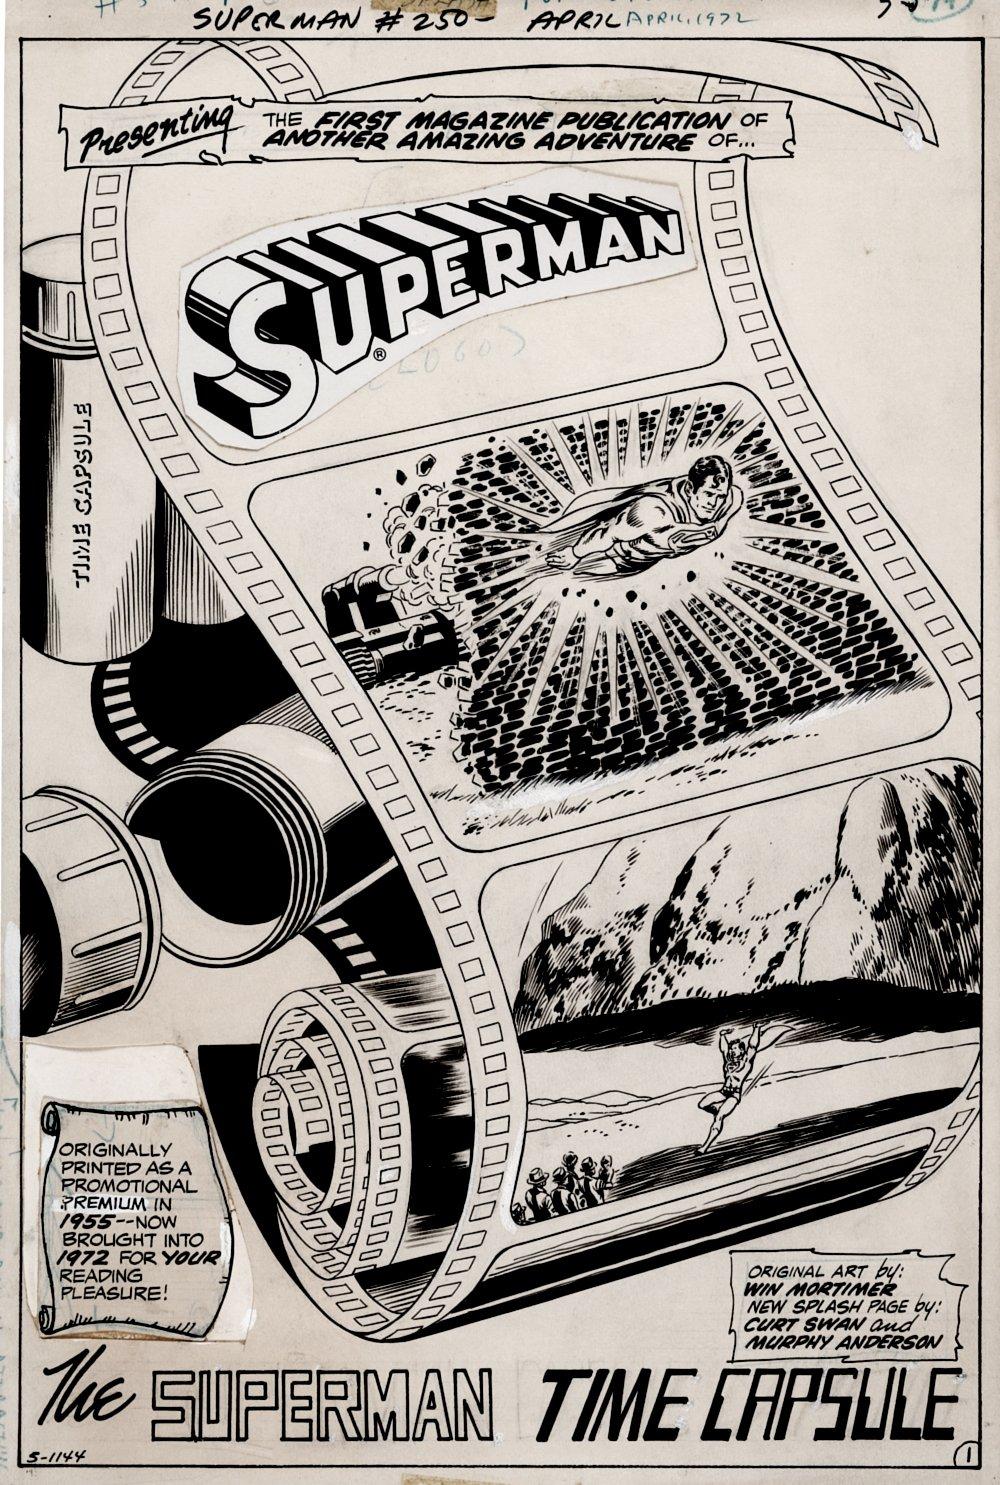 Superman #250 p 1 SPLASH (Superman Flies Off The Film Roll!) 1971